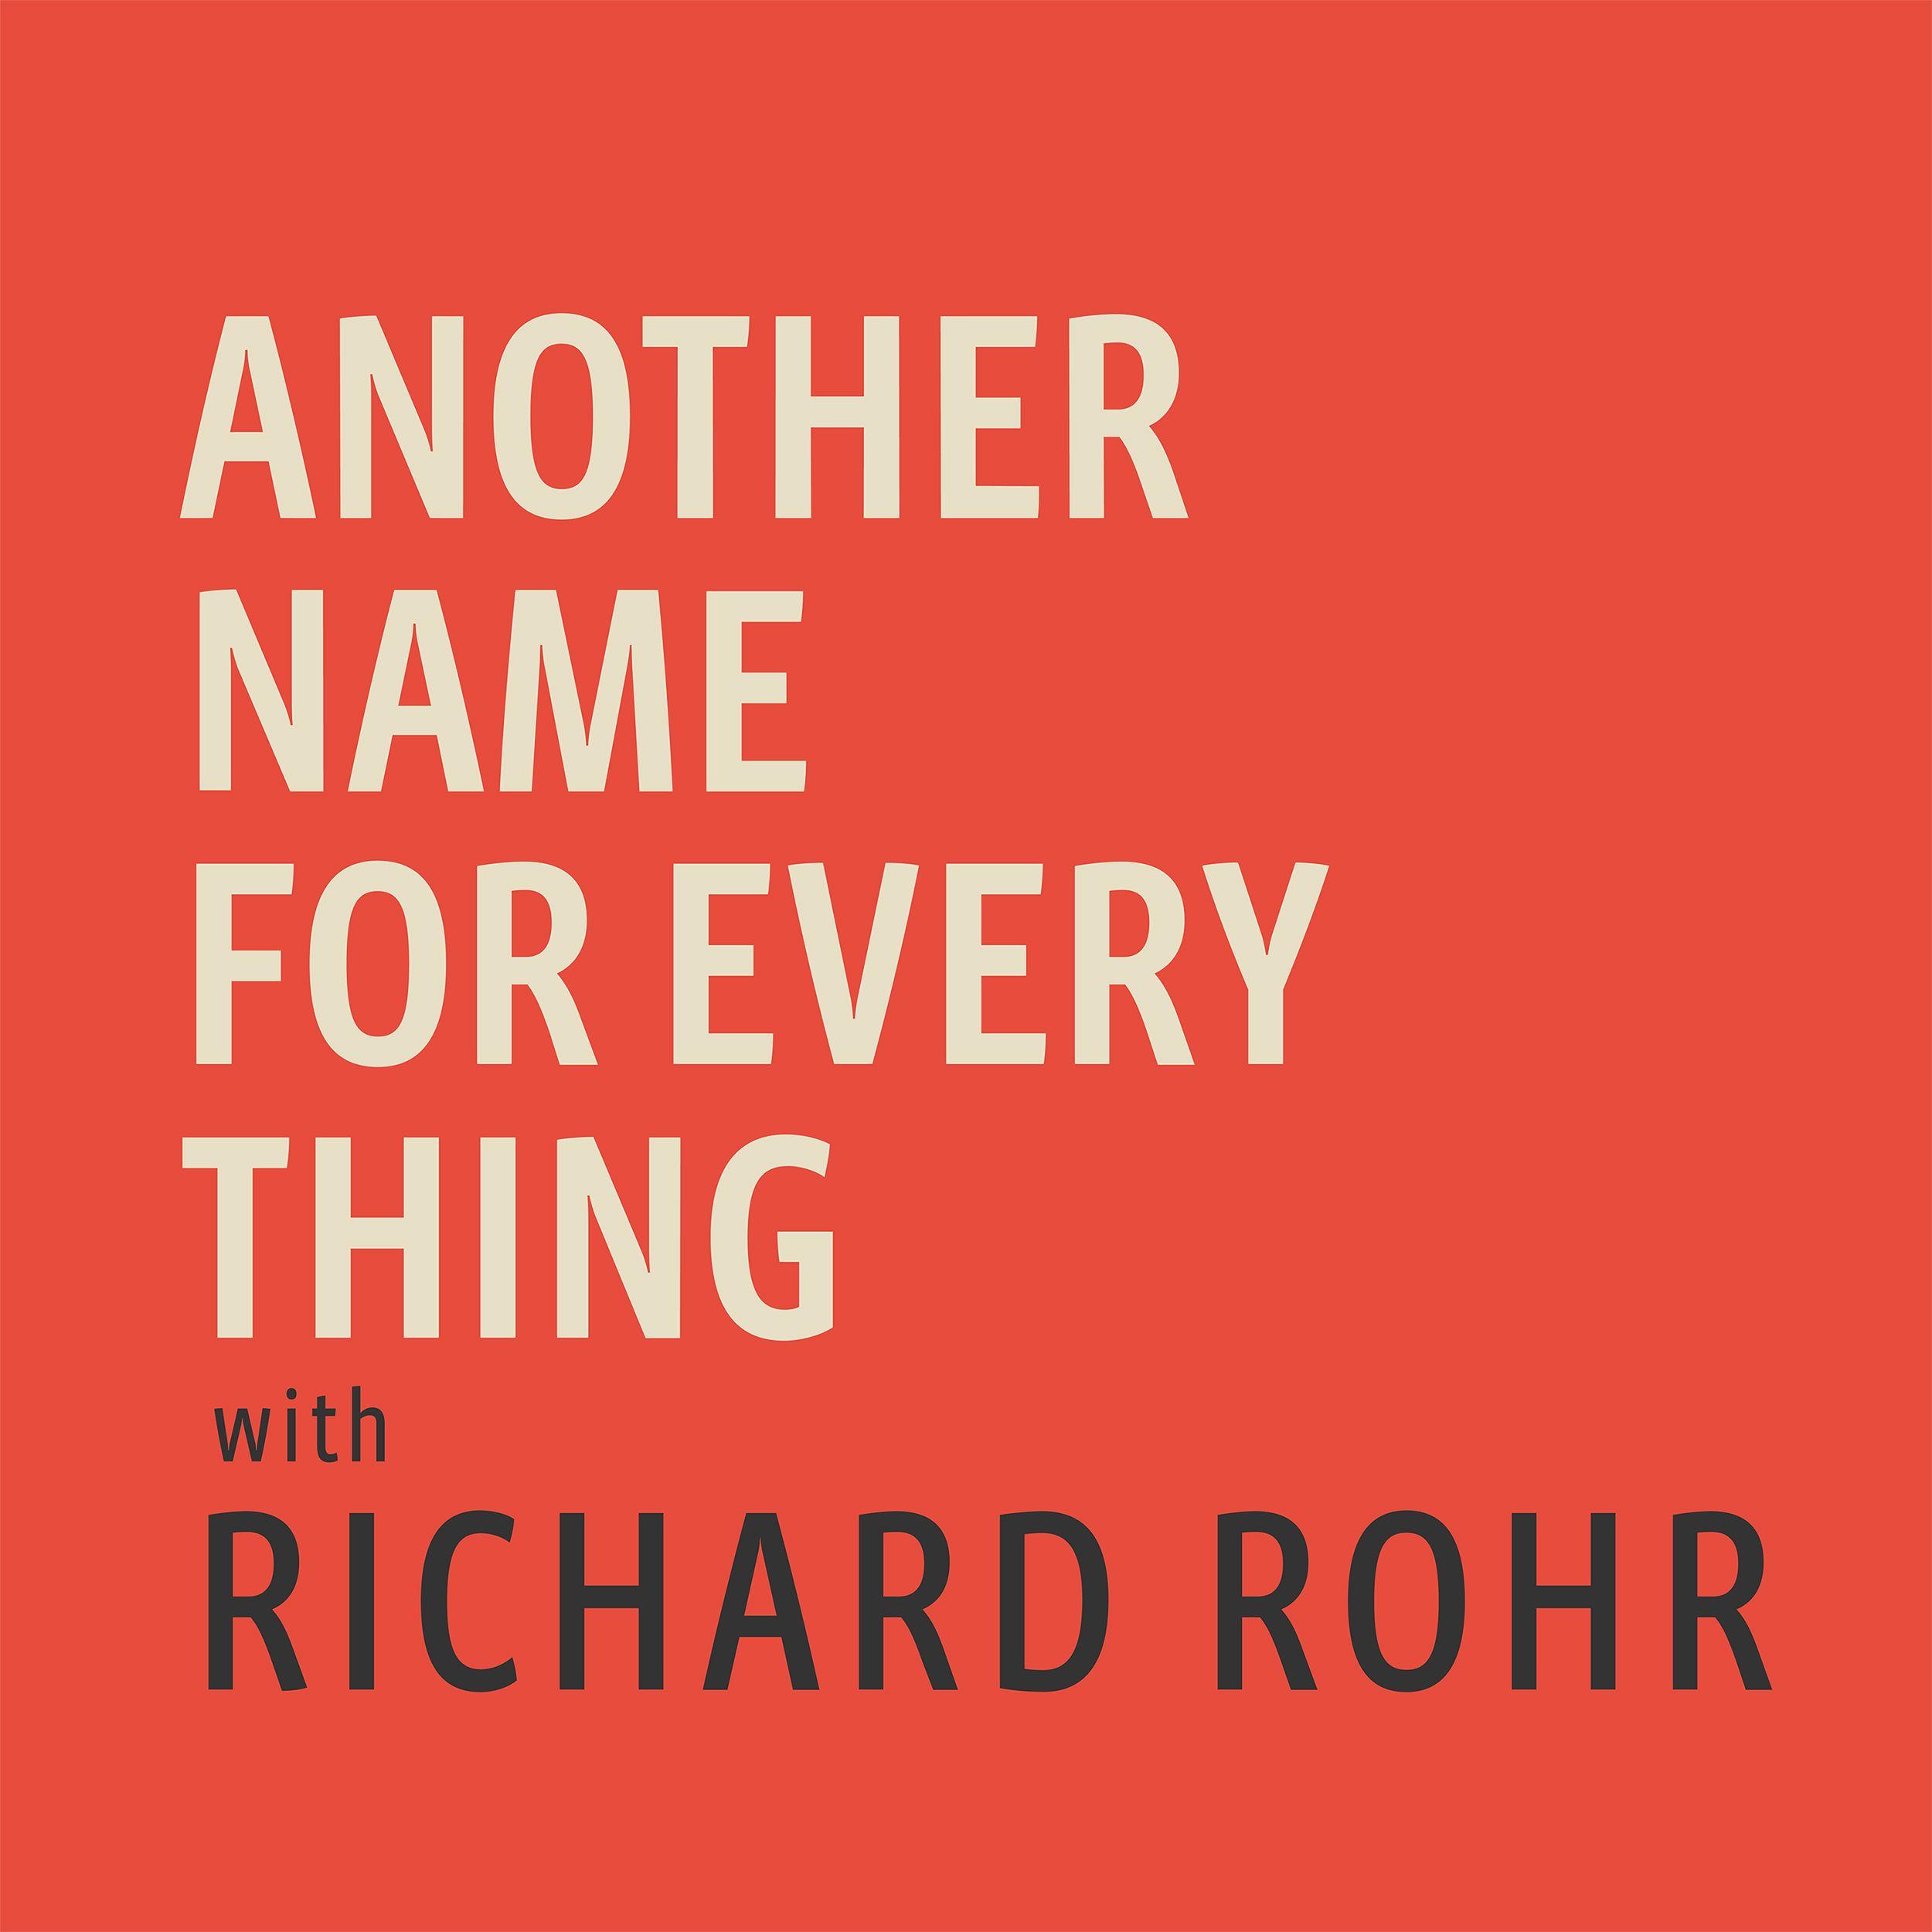 richard rohr quotes universal christ